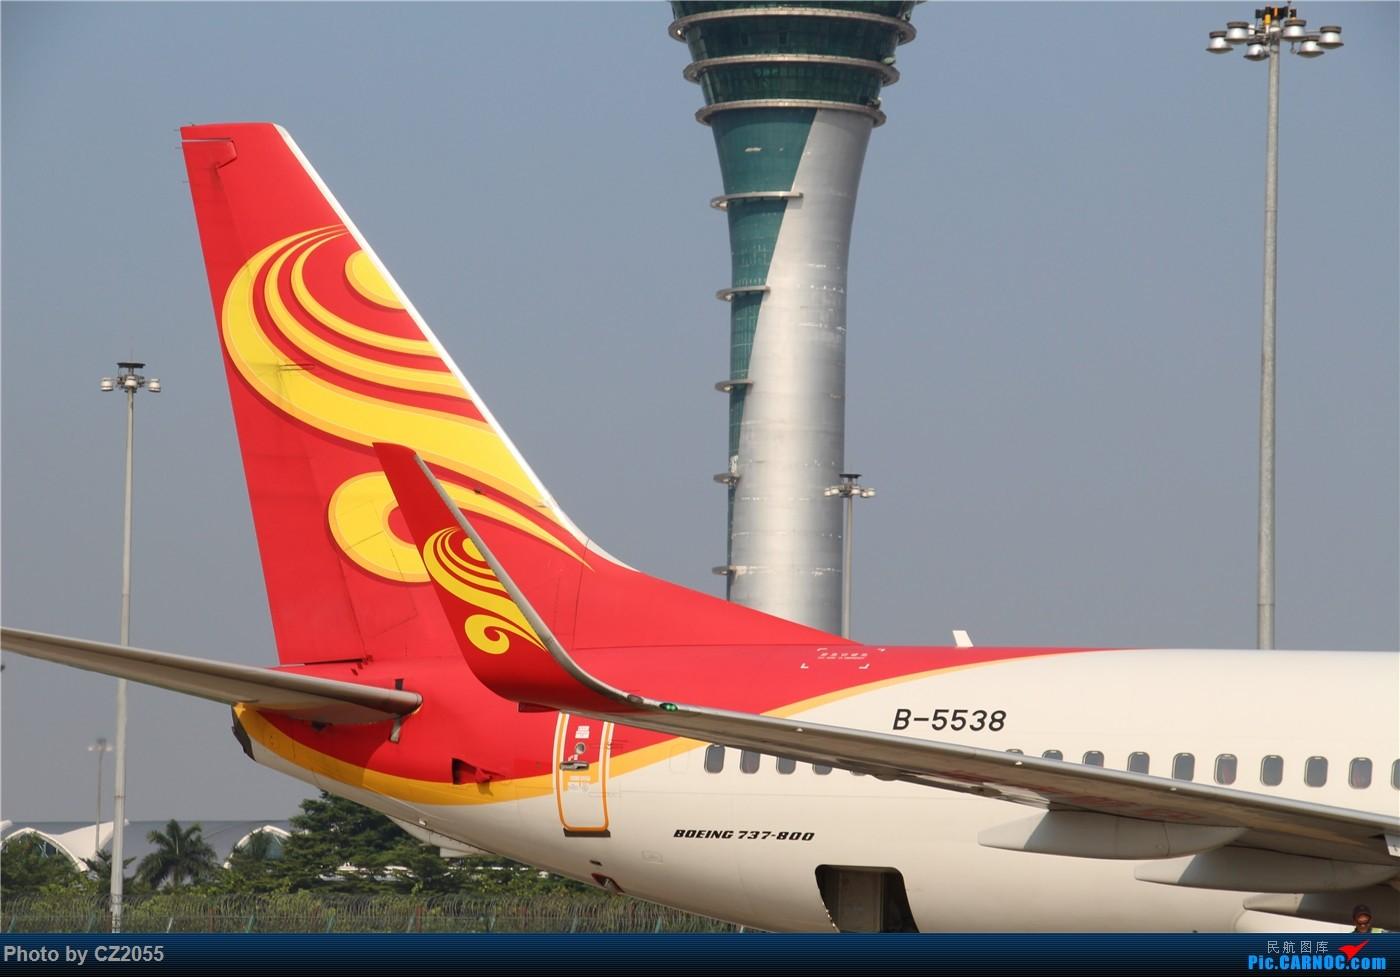 Re:[原创]【广东青少年拍机小队】【C-Z-2055(1)】Aug.8.2015 不期而遇,相伴相惜。首次体验SKYTRAX五星航空公司-海南航空。 BOEING 737-800 B-5538 中国广州白云国际机场